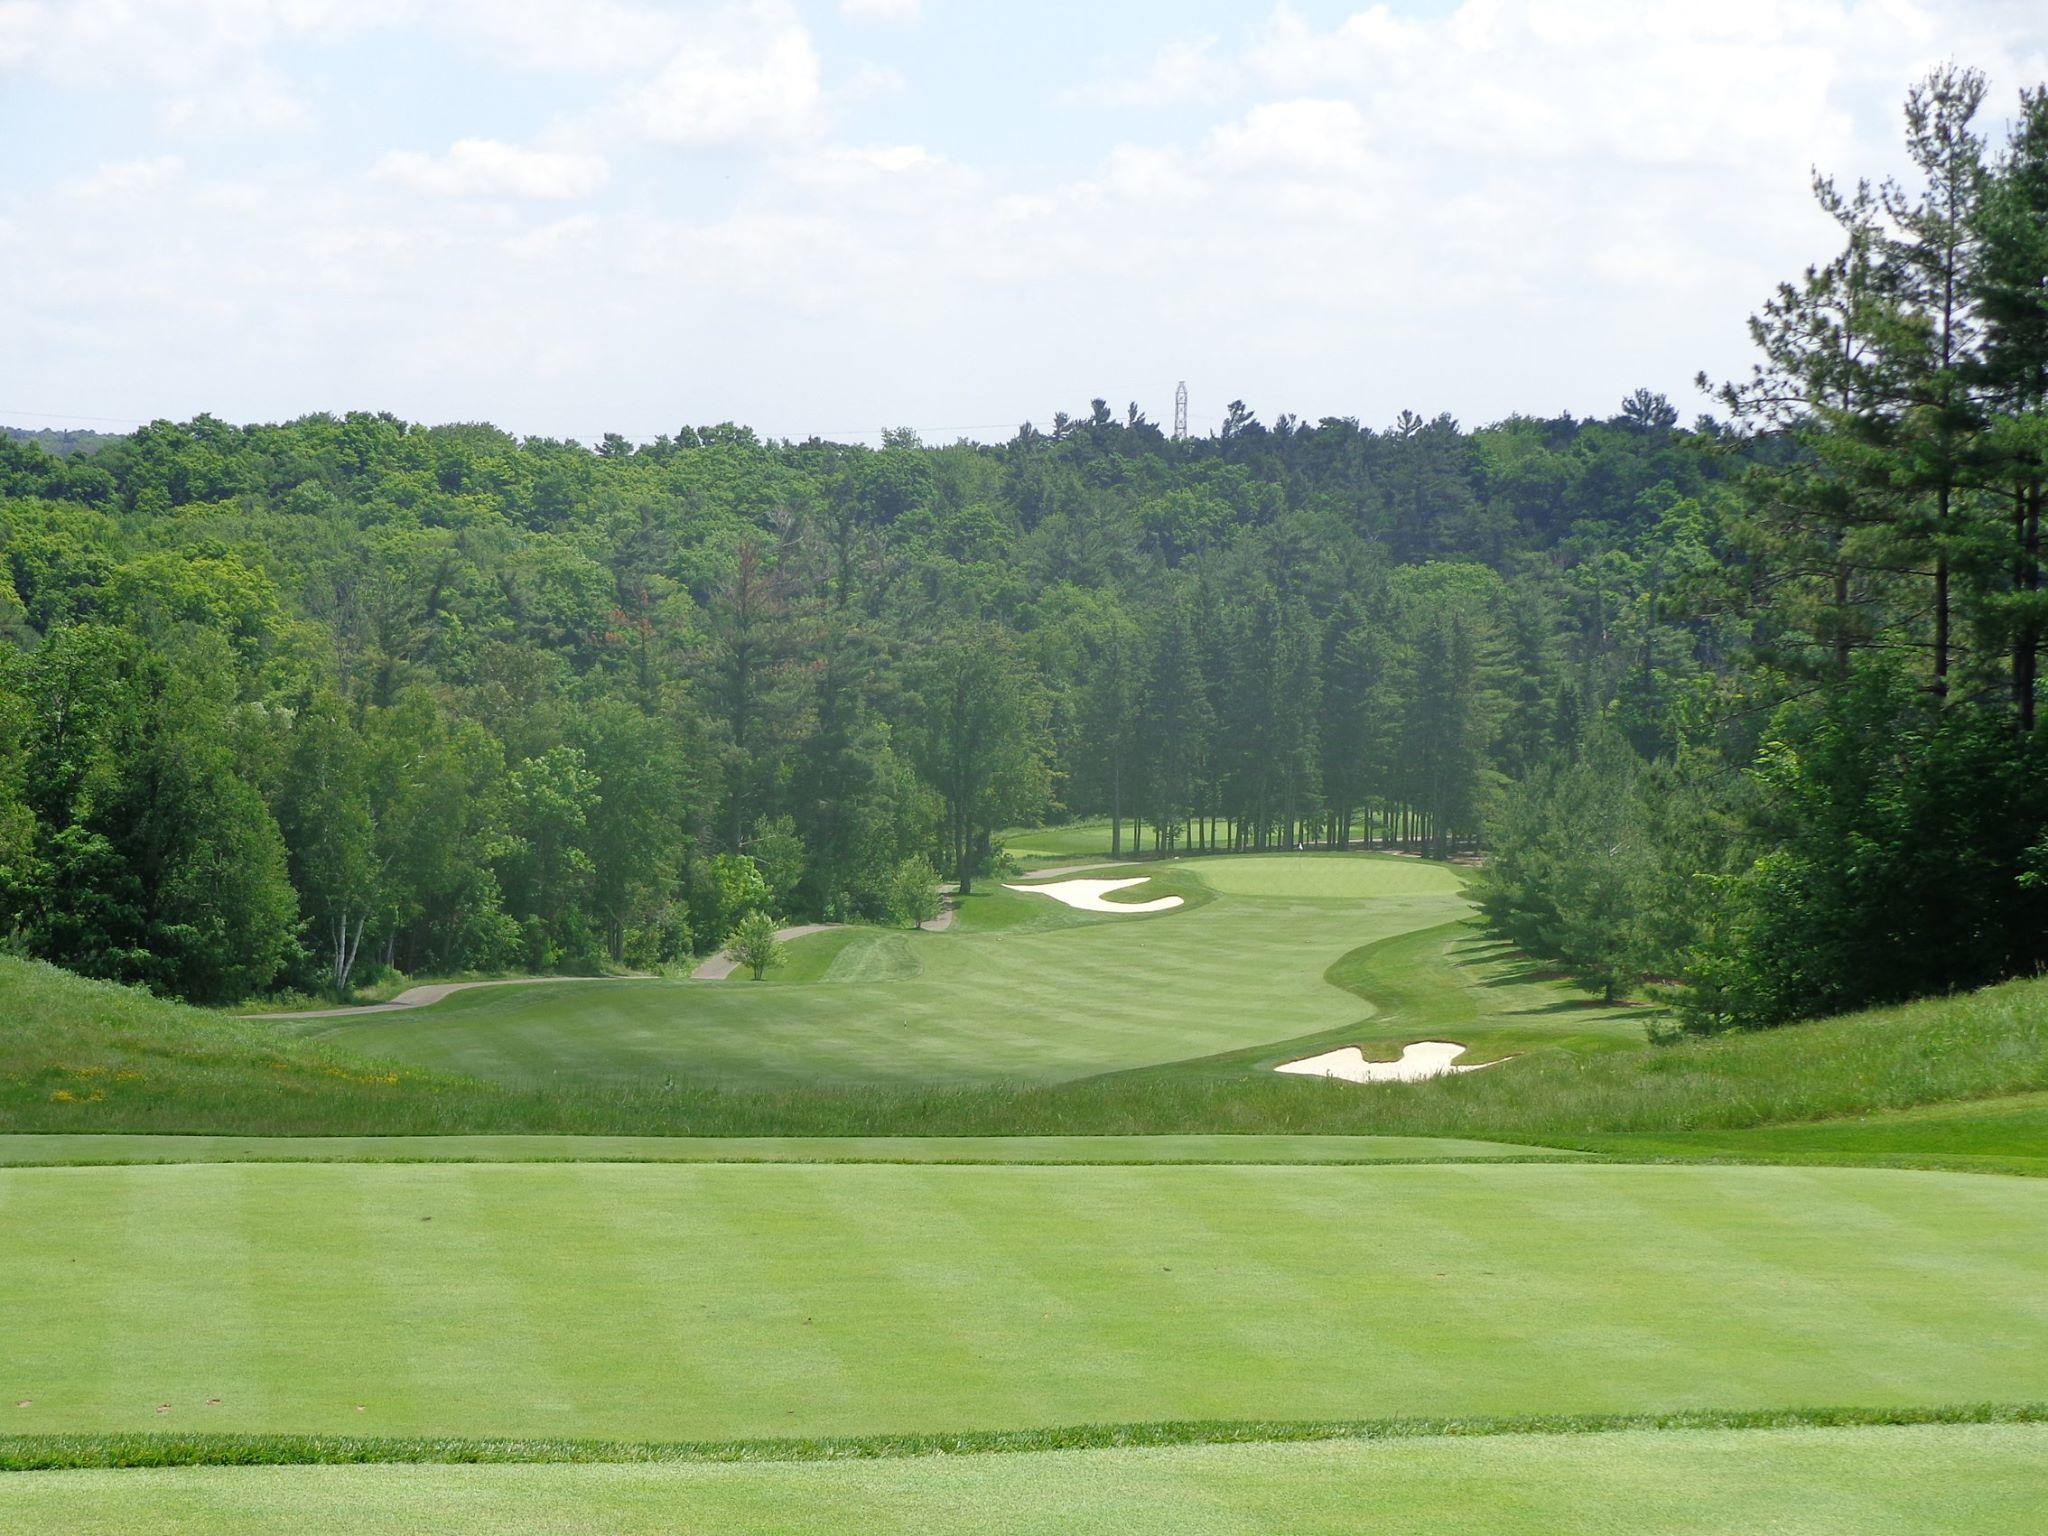 Copper creek golf club cover picture